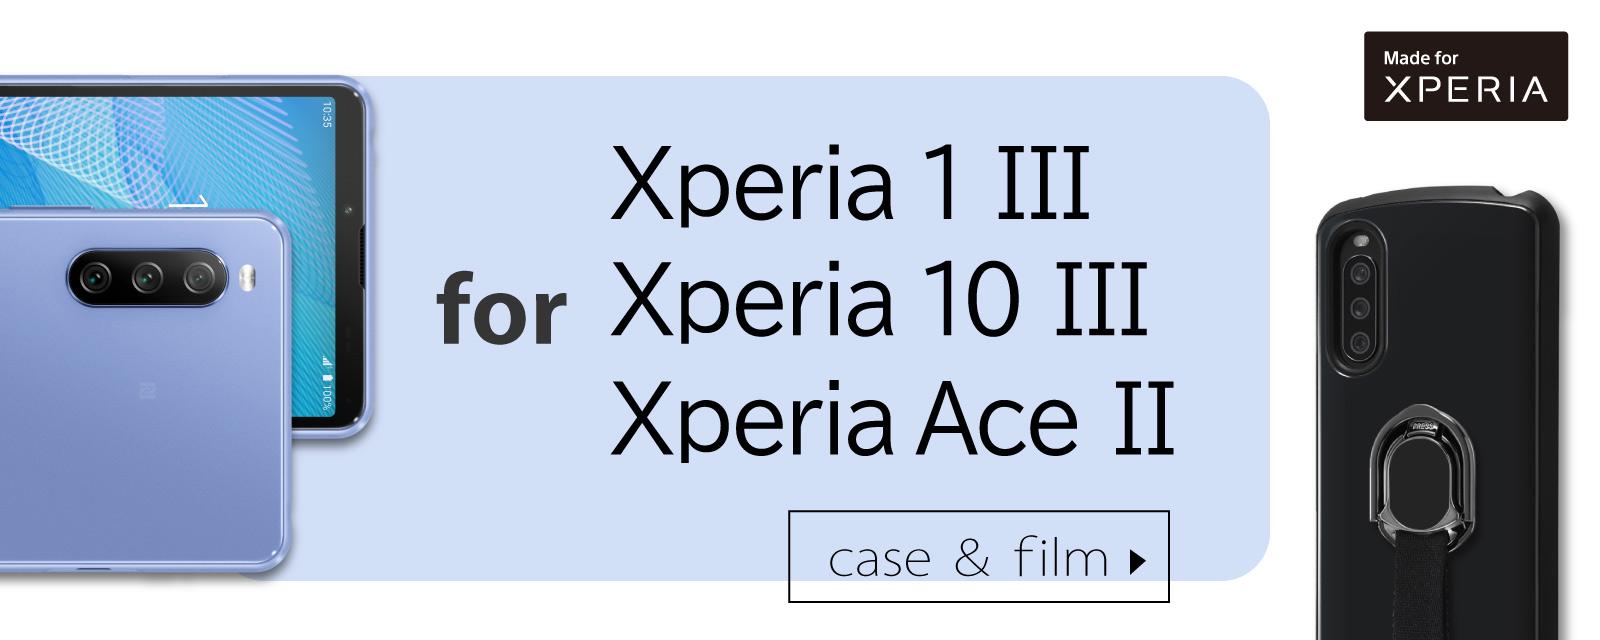 Xperia最新機種 特集